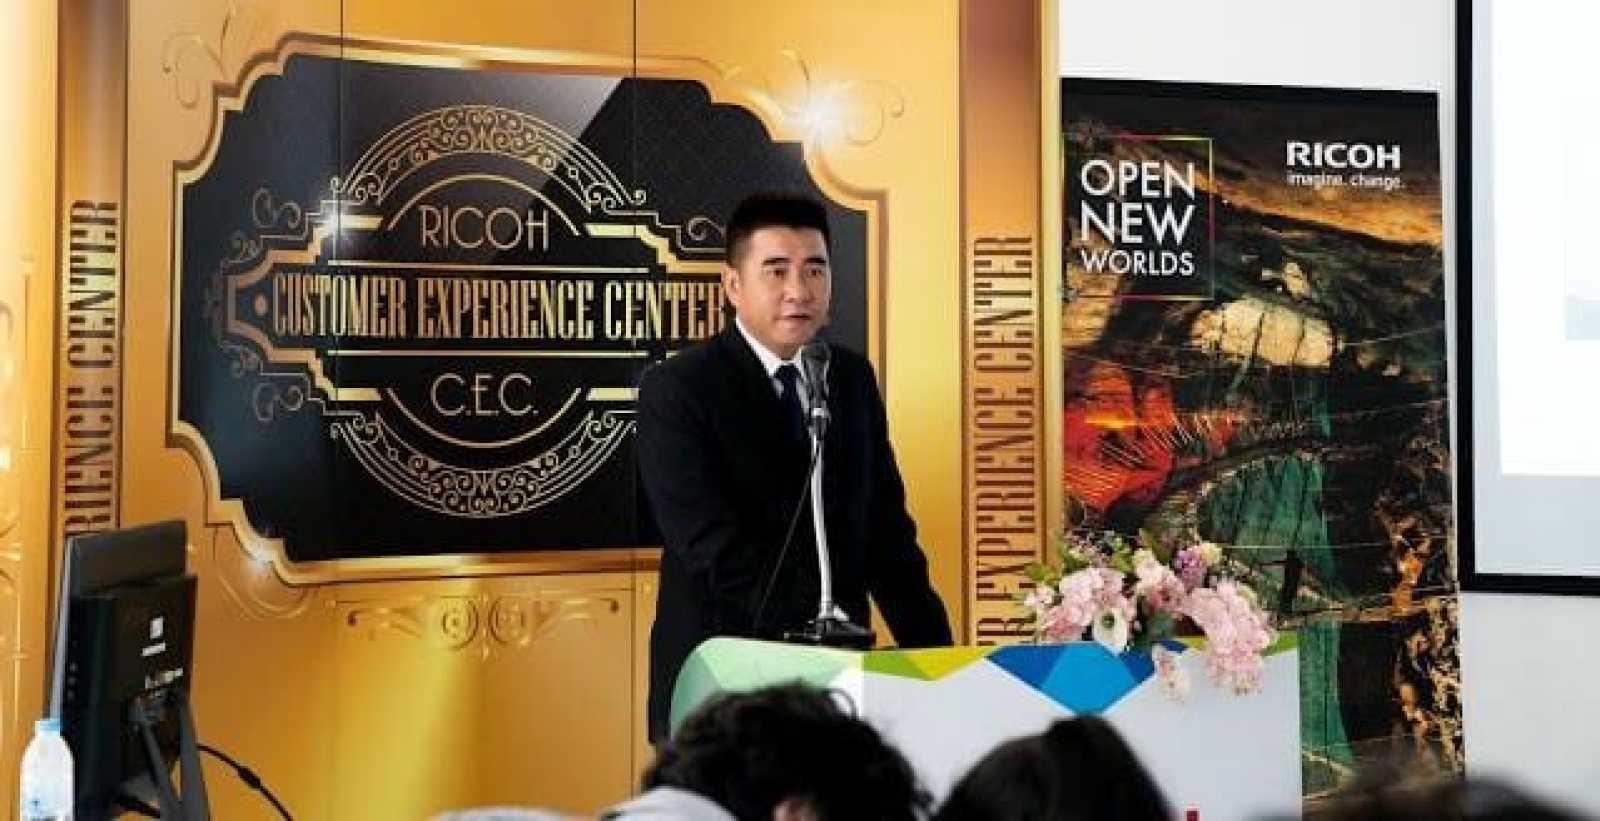 - DSC07810 2 - RICOH เปิดตัวผลิตภัณฑ์ใหม่ RICOH Pro T7210 และ RICOH Pro C7200x /C7210x ที่ RICOH Asia Pacific Customer Experience Center หรือ CEC